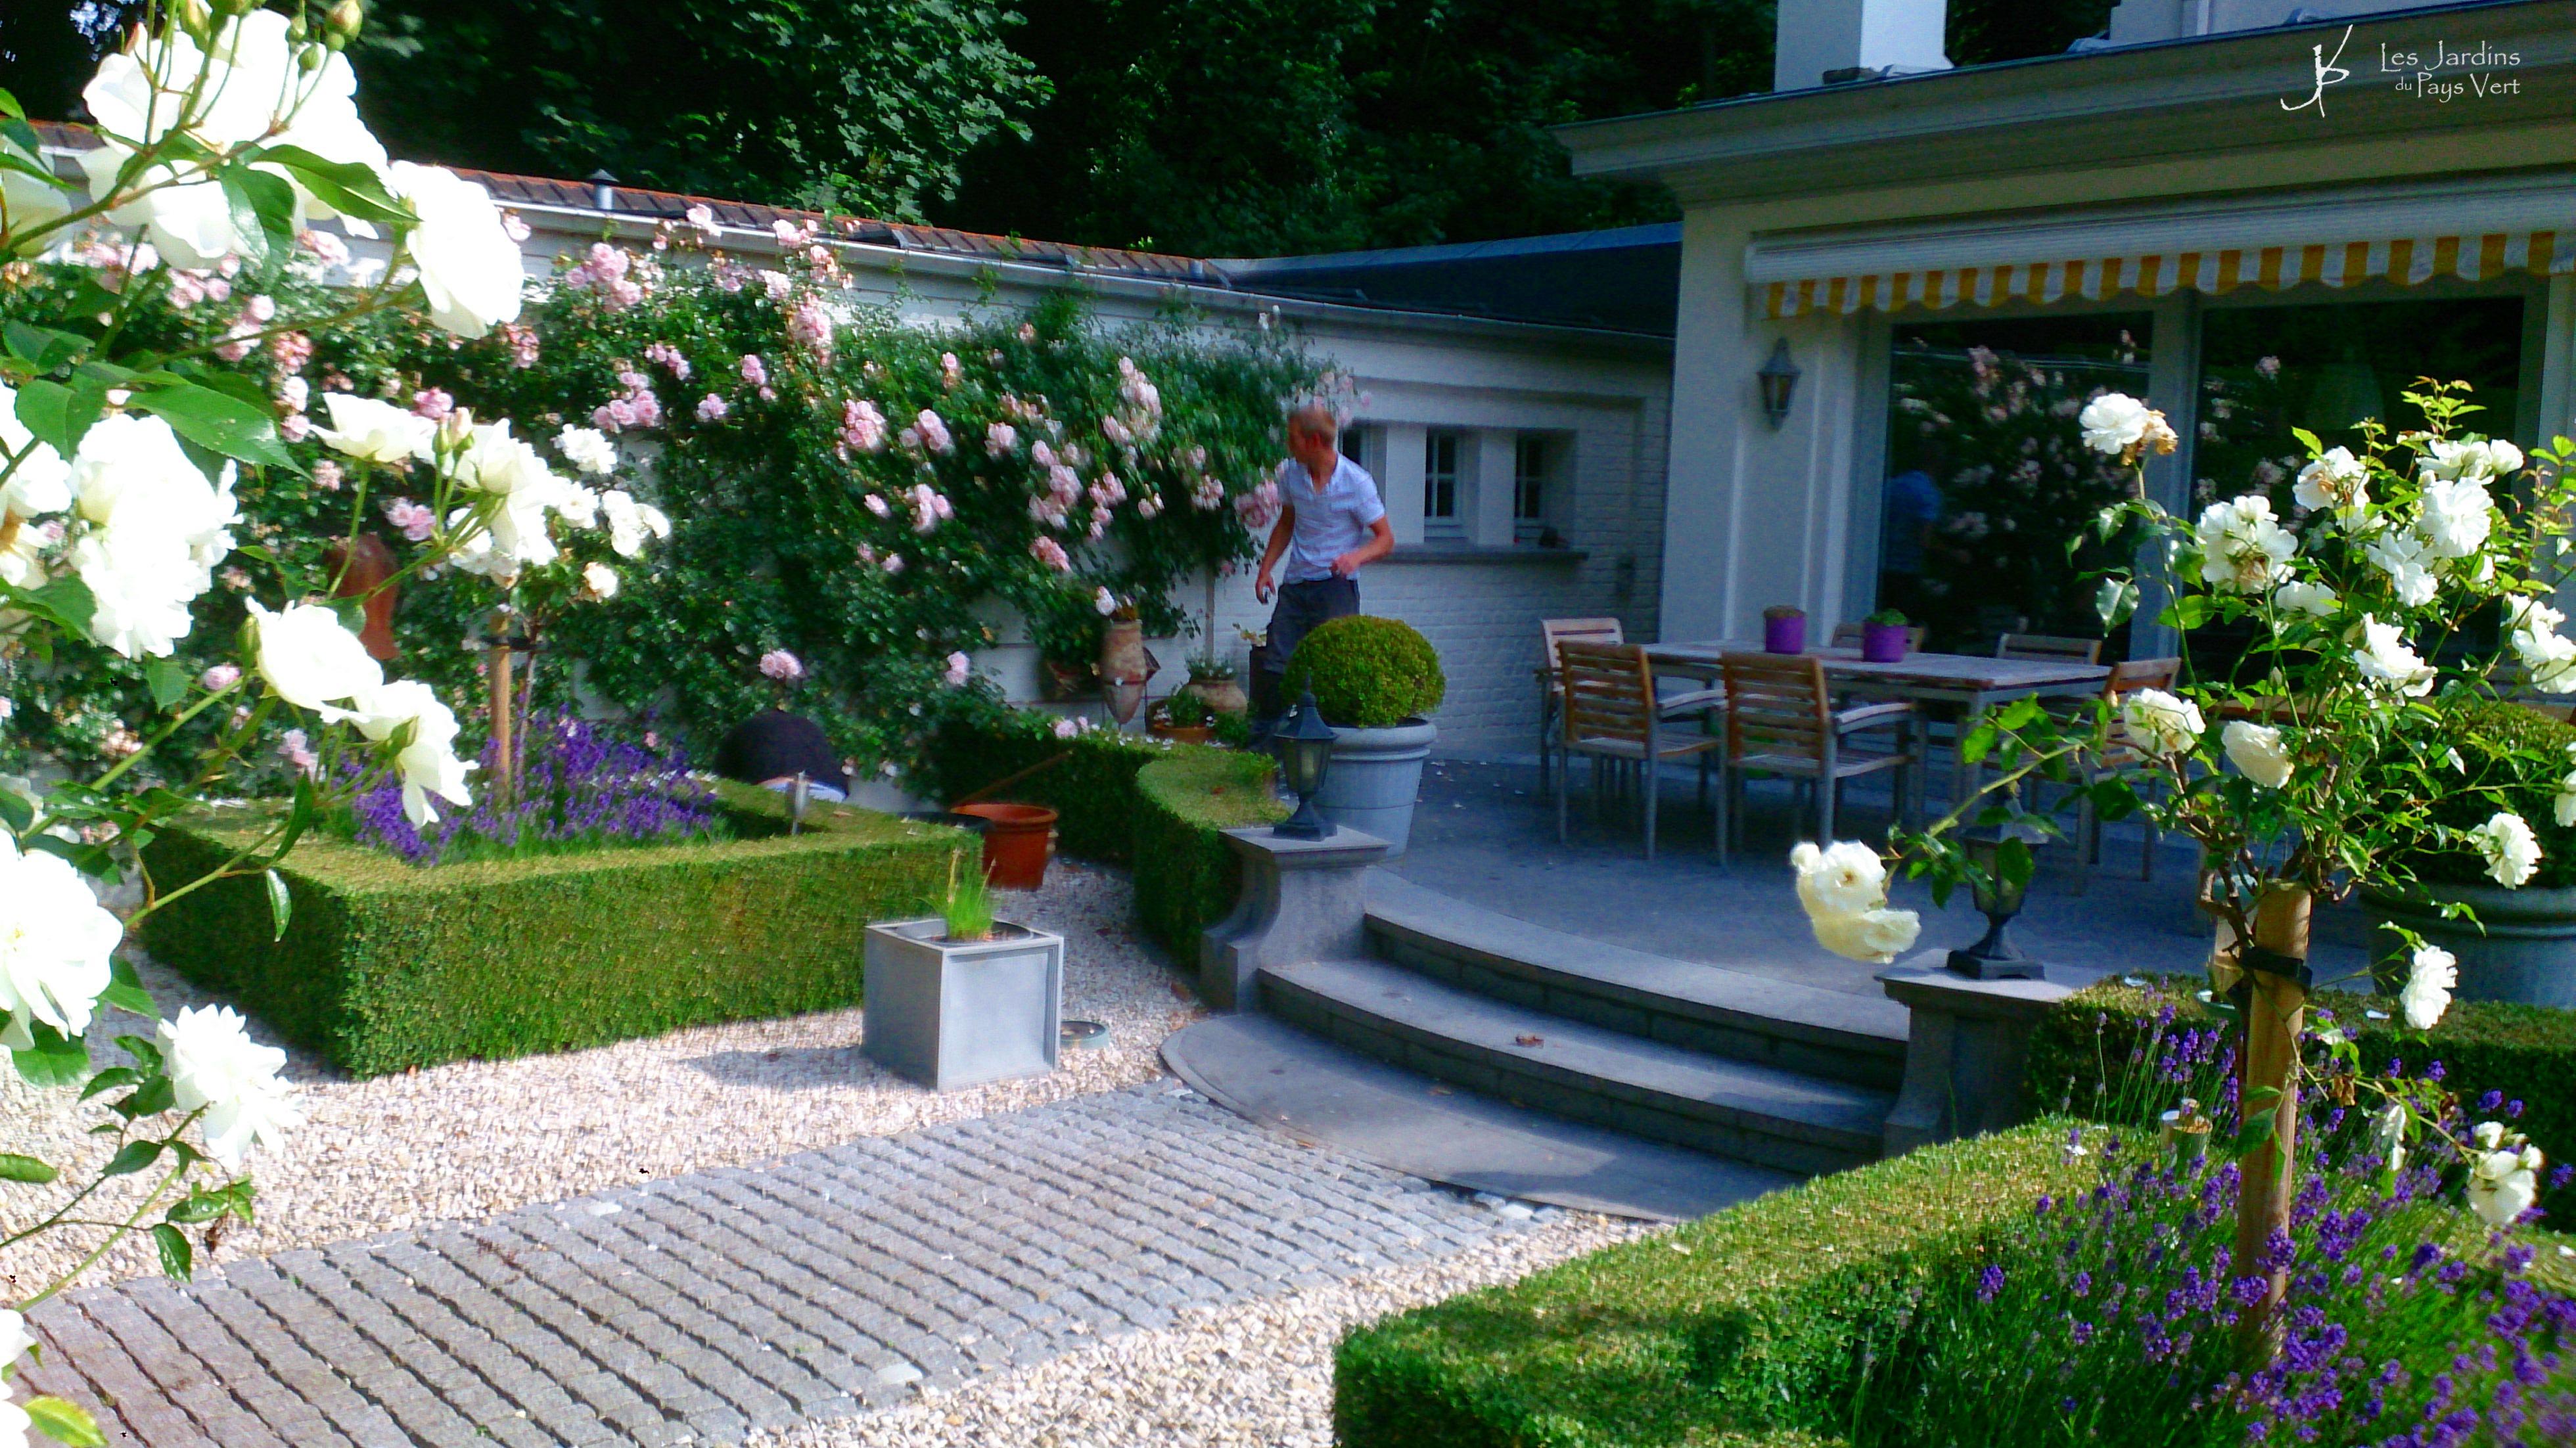 Entretiens de jardins jardins du pays vert for Entretien jardin decembre